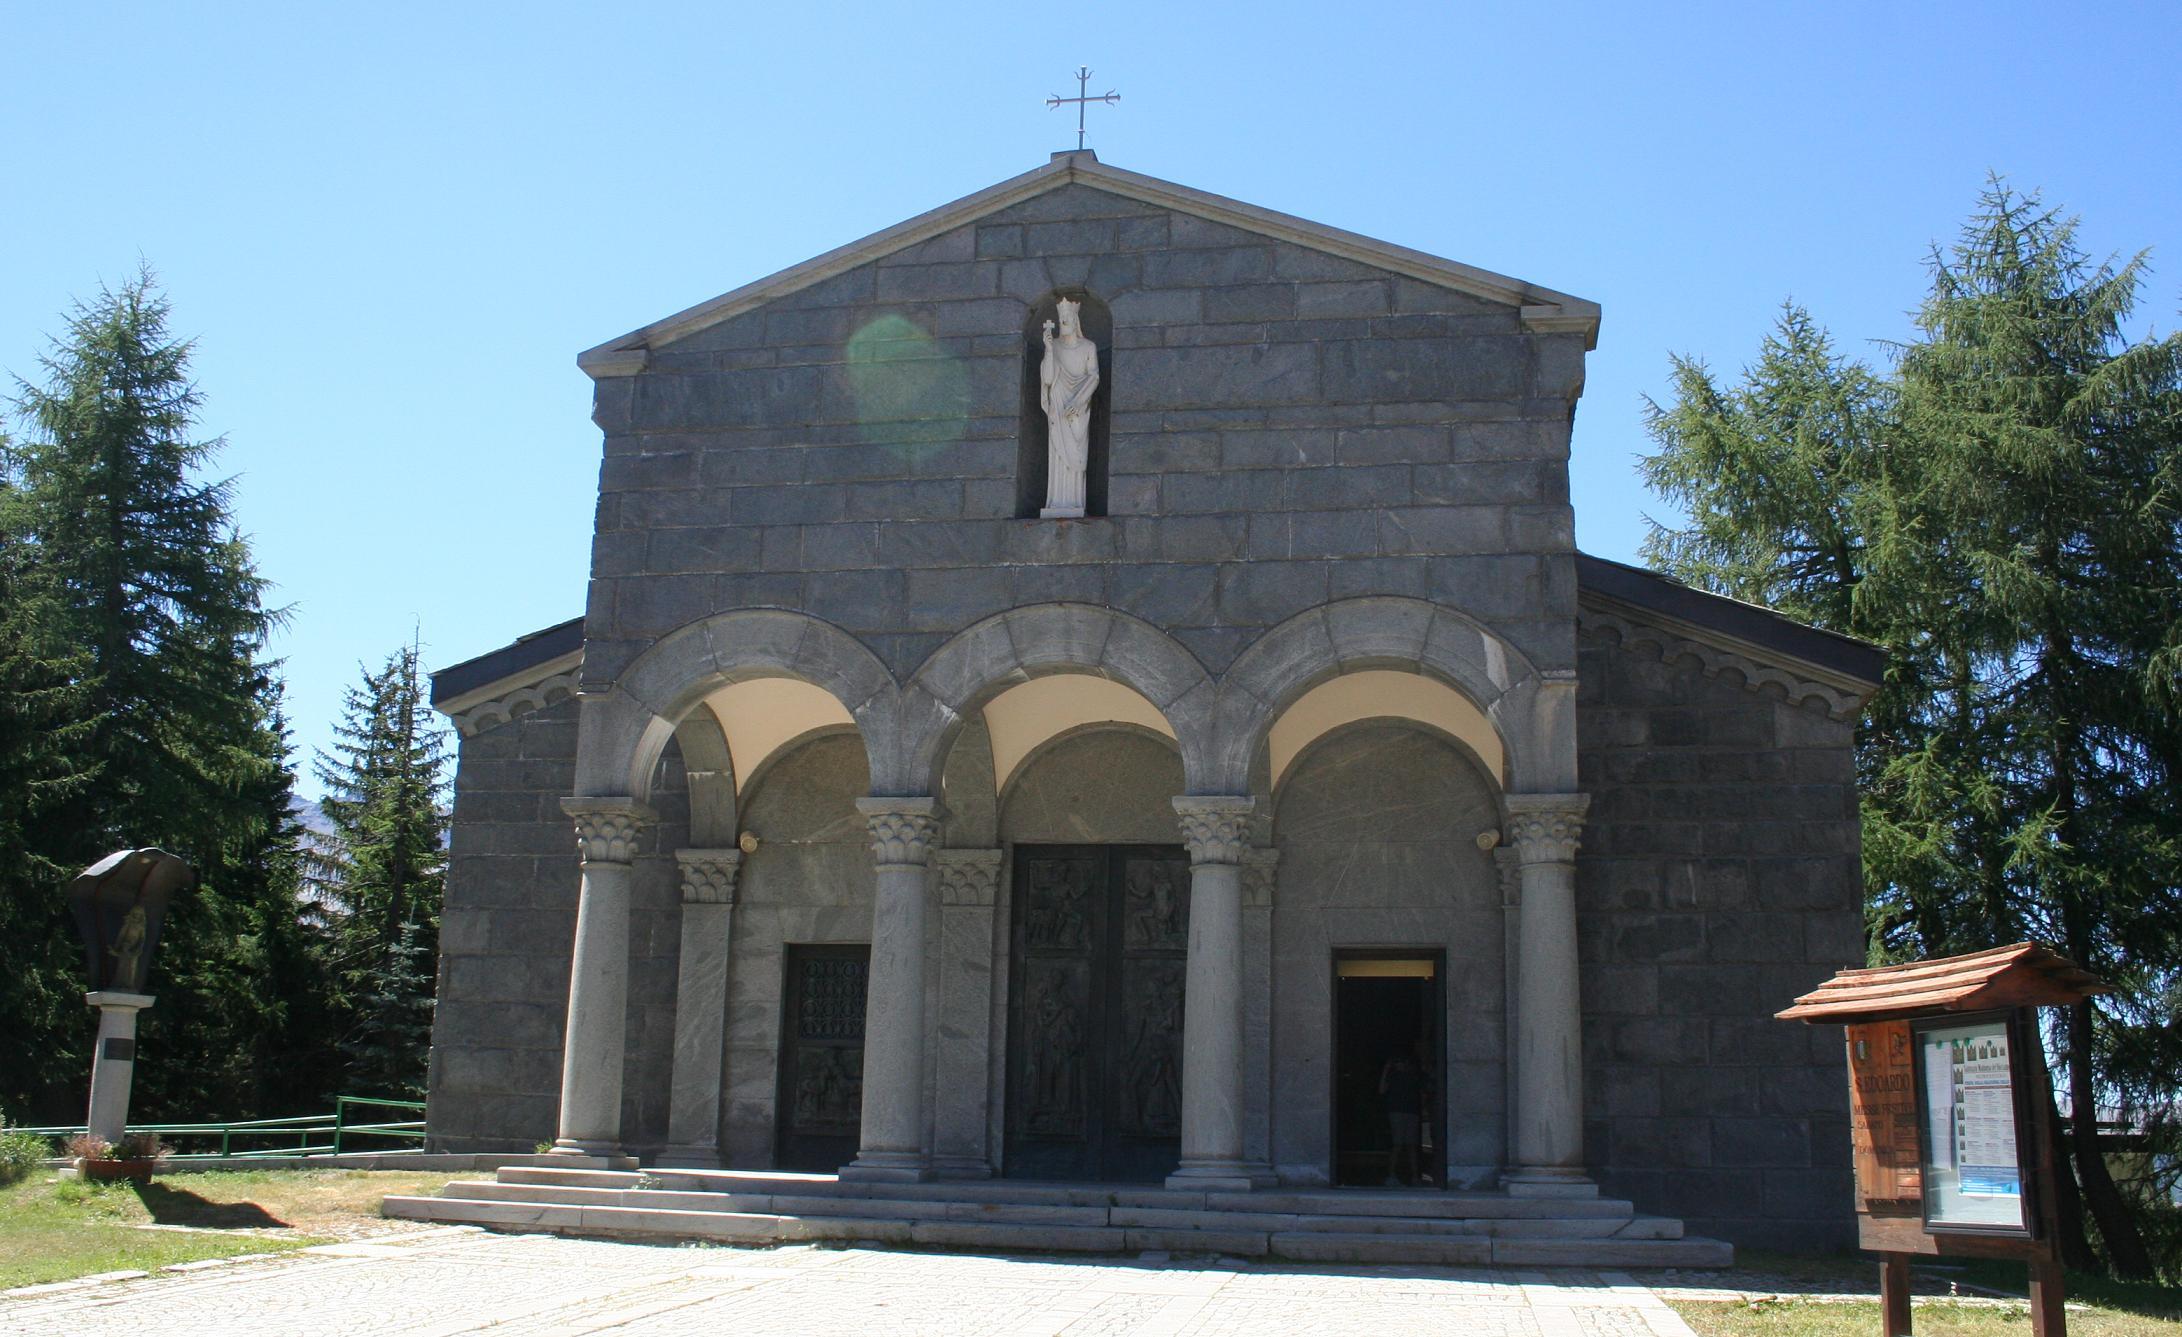 Chiesa_sant'edoardo_sestriere